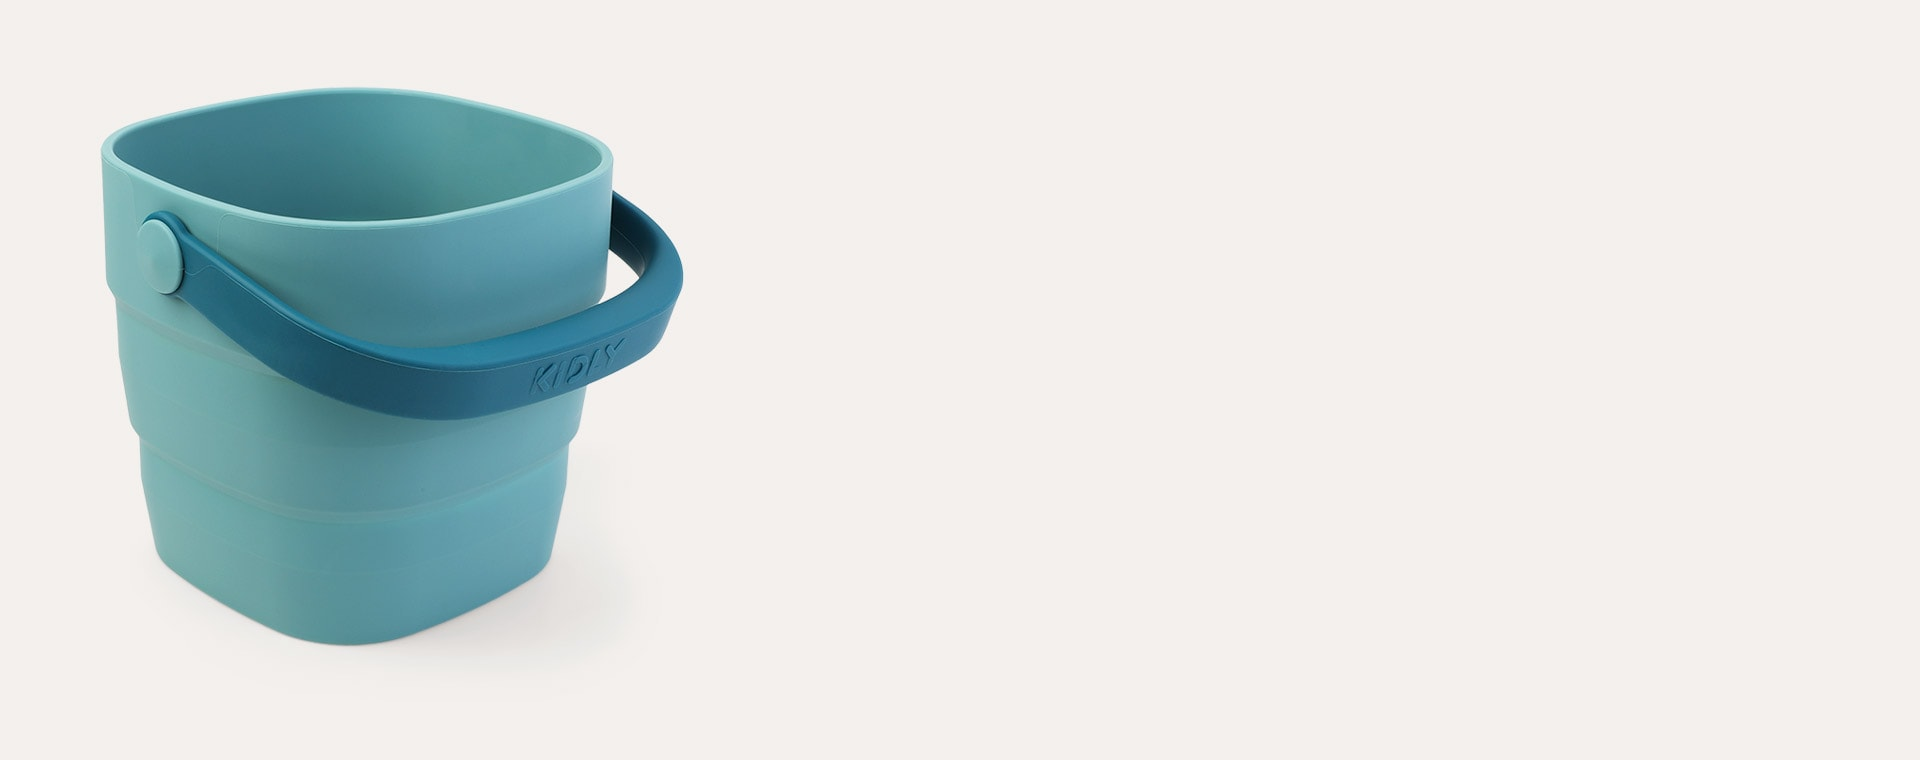 Teal KIDLY Label Foldaway Bucket & Spade Set